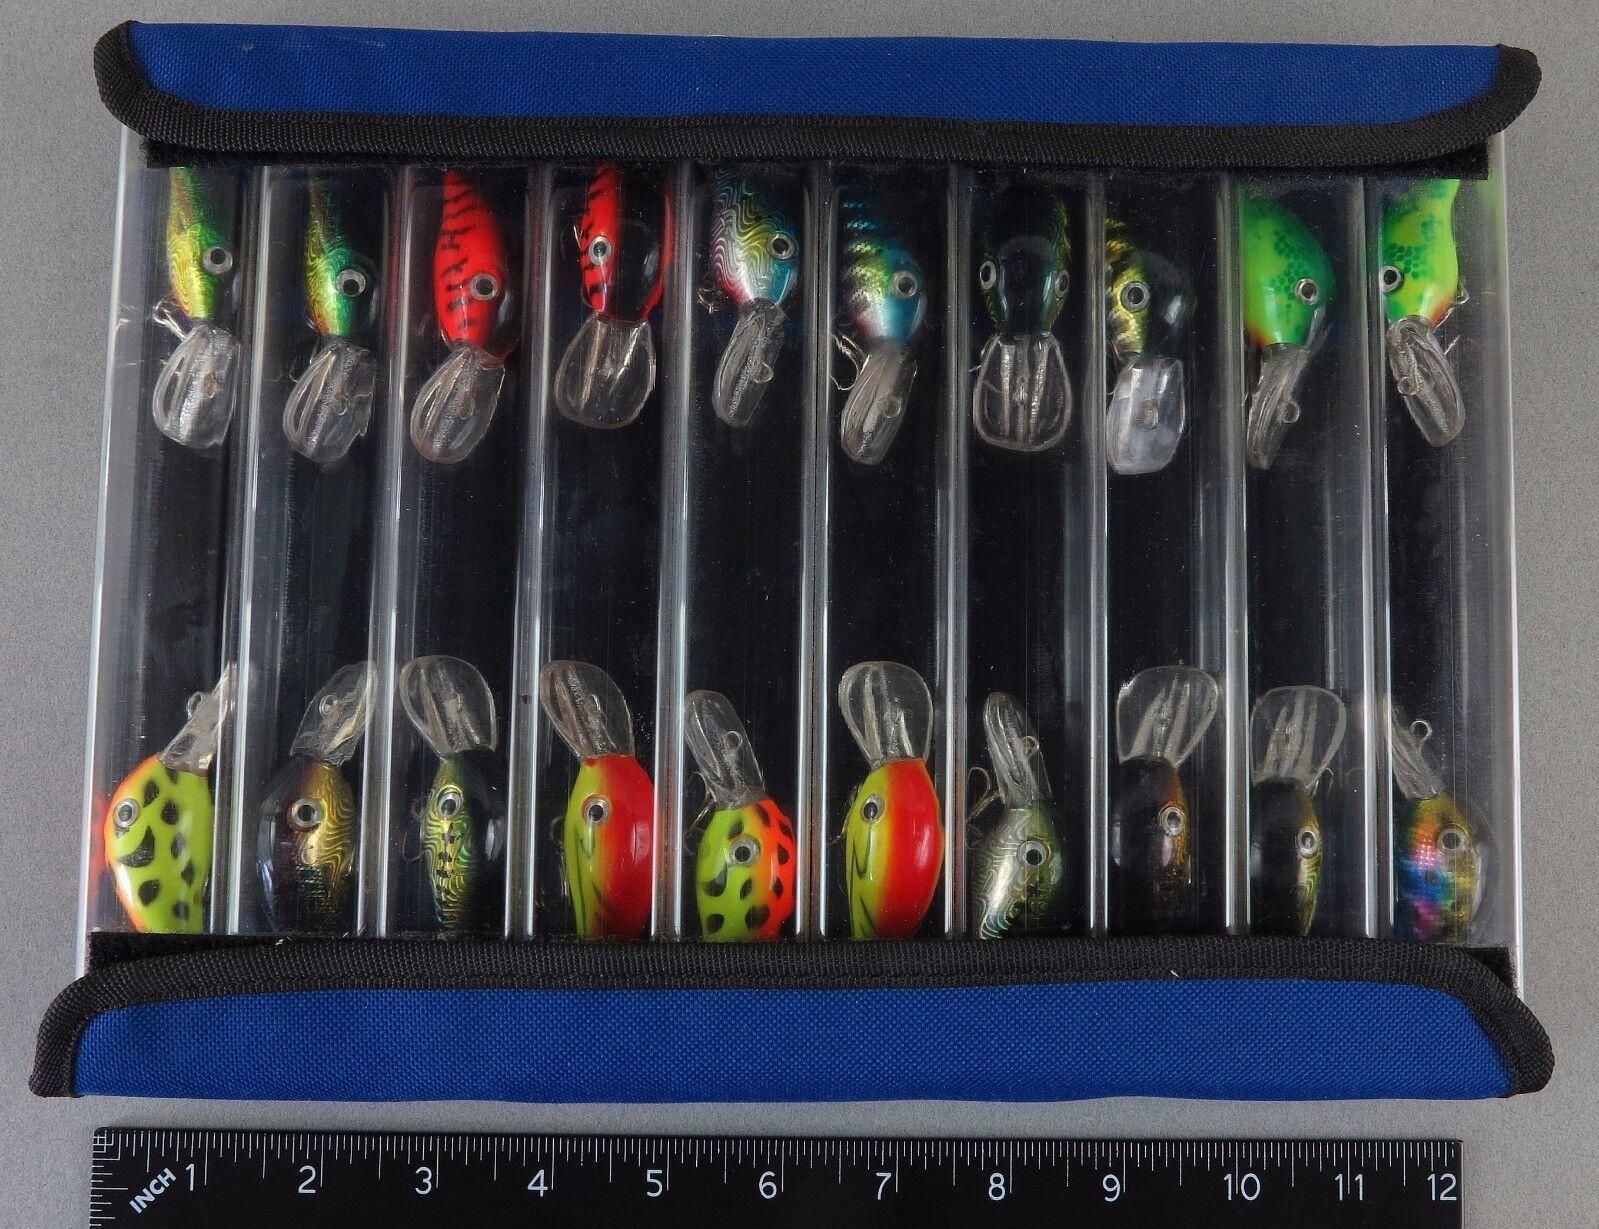 20 New  Crankbaits w Case Bass Crankbait Assortment  free shipping & exchanges.